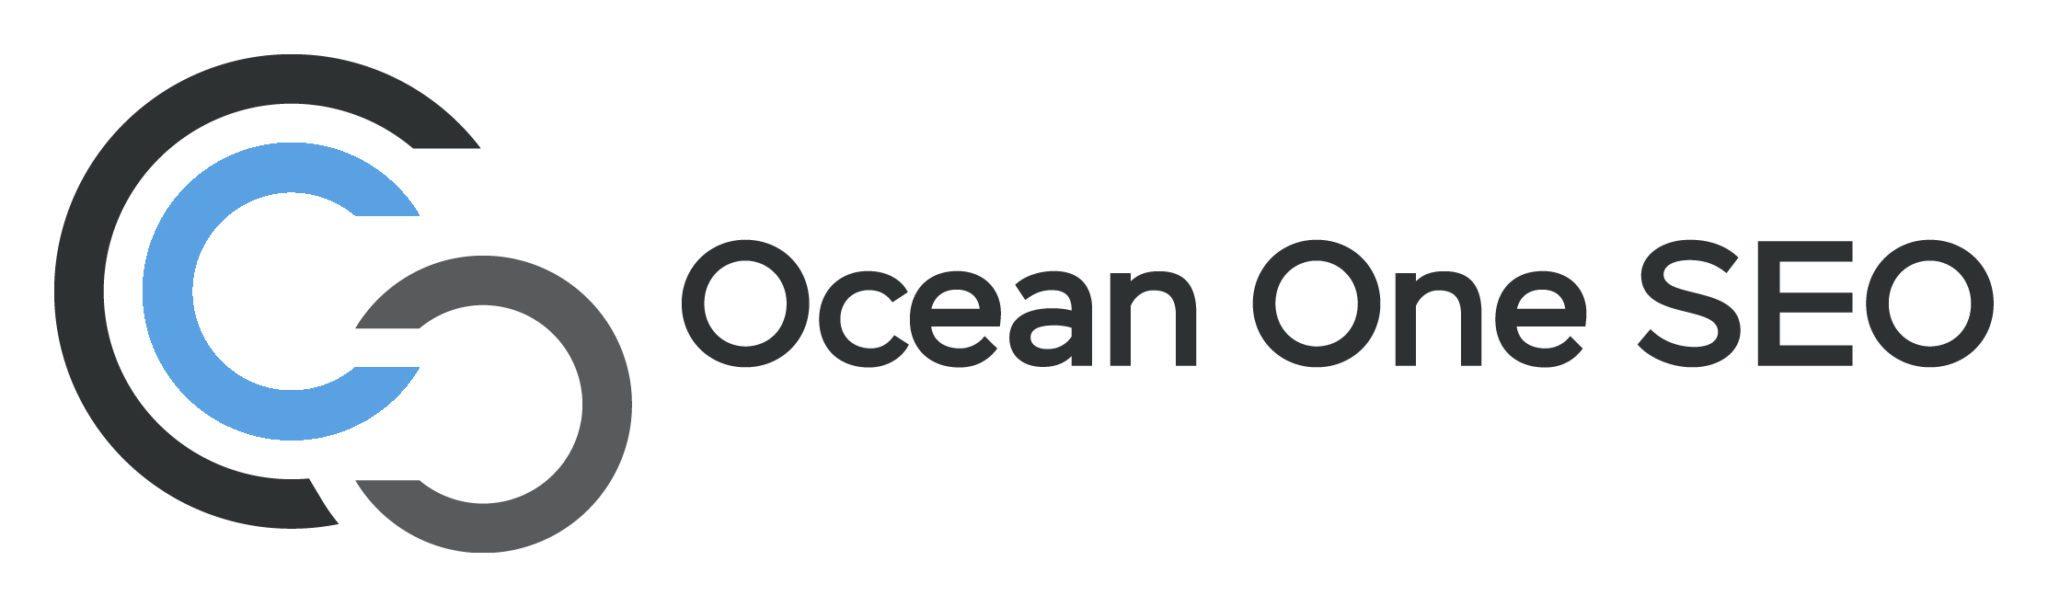 Ocean One SEO